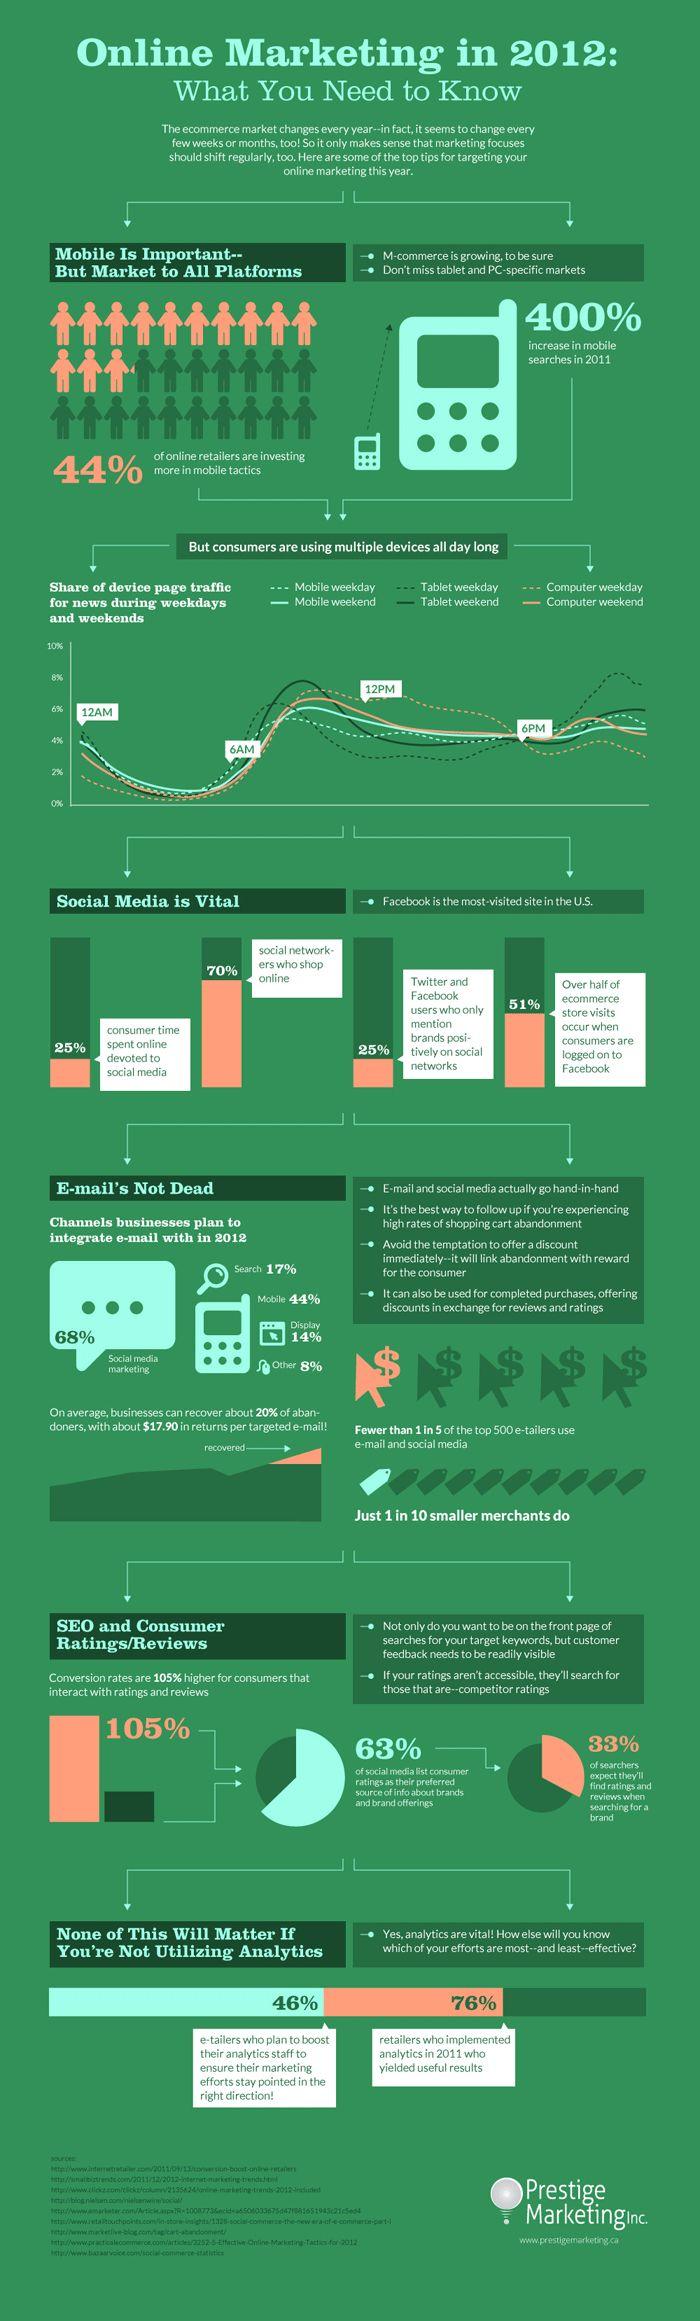 Internet Marketing Statistics 2012 - #digitalmarketing     More here: http://bit.ly/HDBr3X